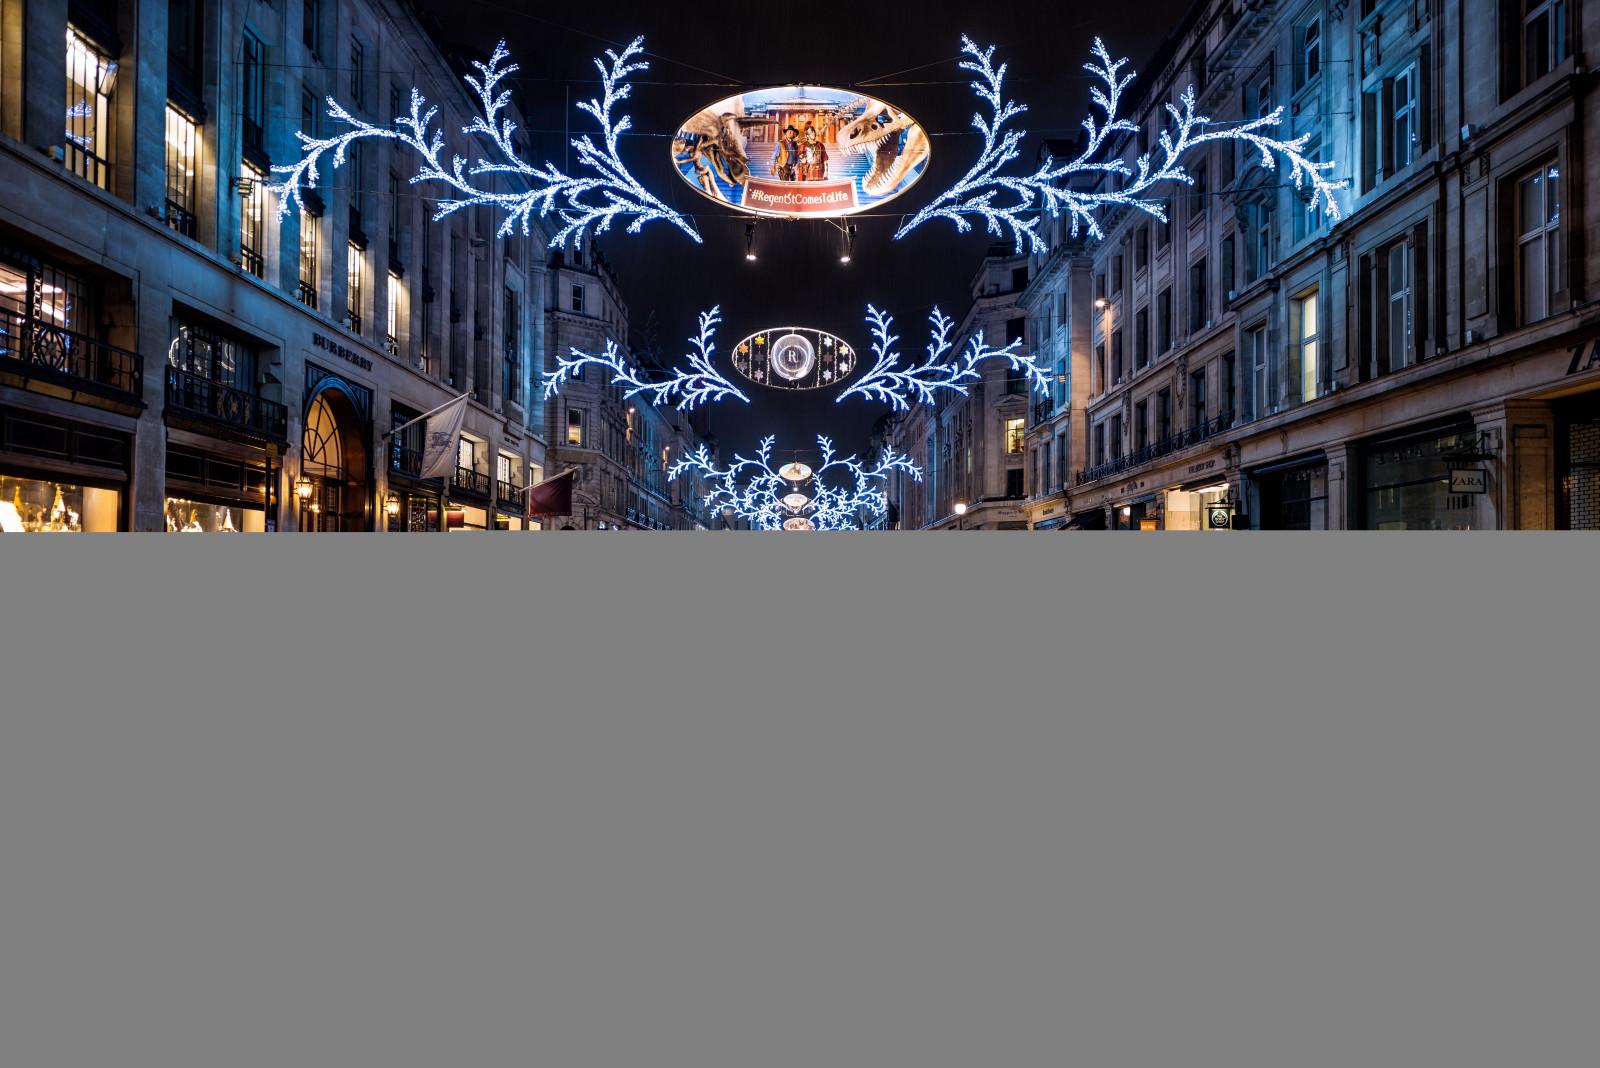 Lights London City Street Night Architecture Reflection Rain Tourism England Nikon Christmas UK Empty Shopping Festive